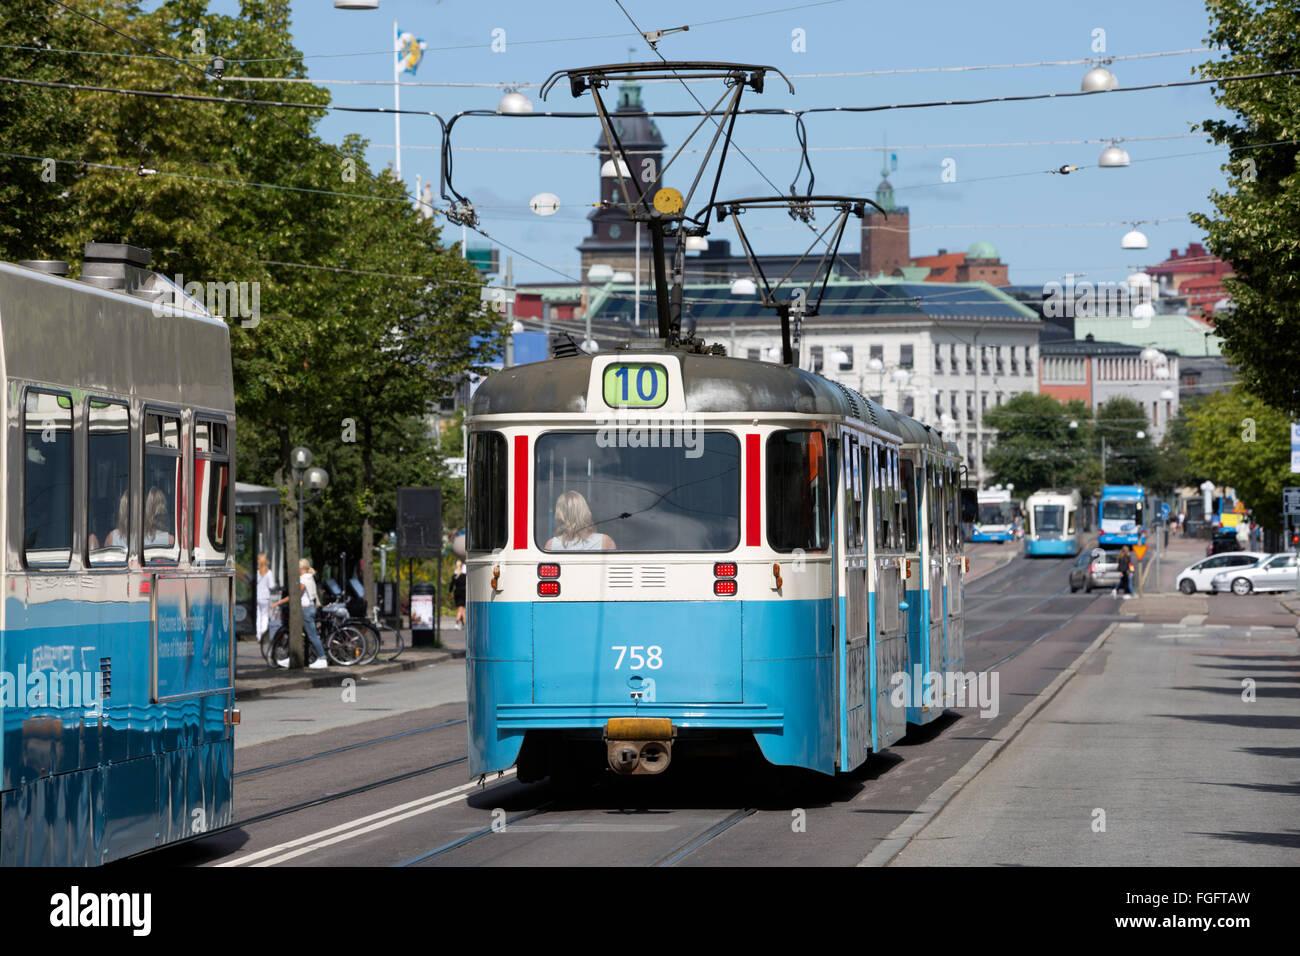 Tranvías en Kungsportsavenyen, Gotemburgo, West Gothland, Suecia, Escandinavia, Europa Foto de stock